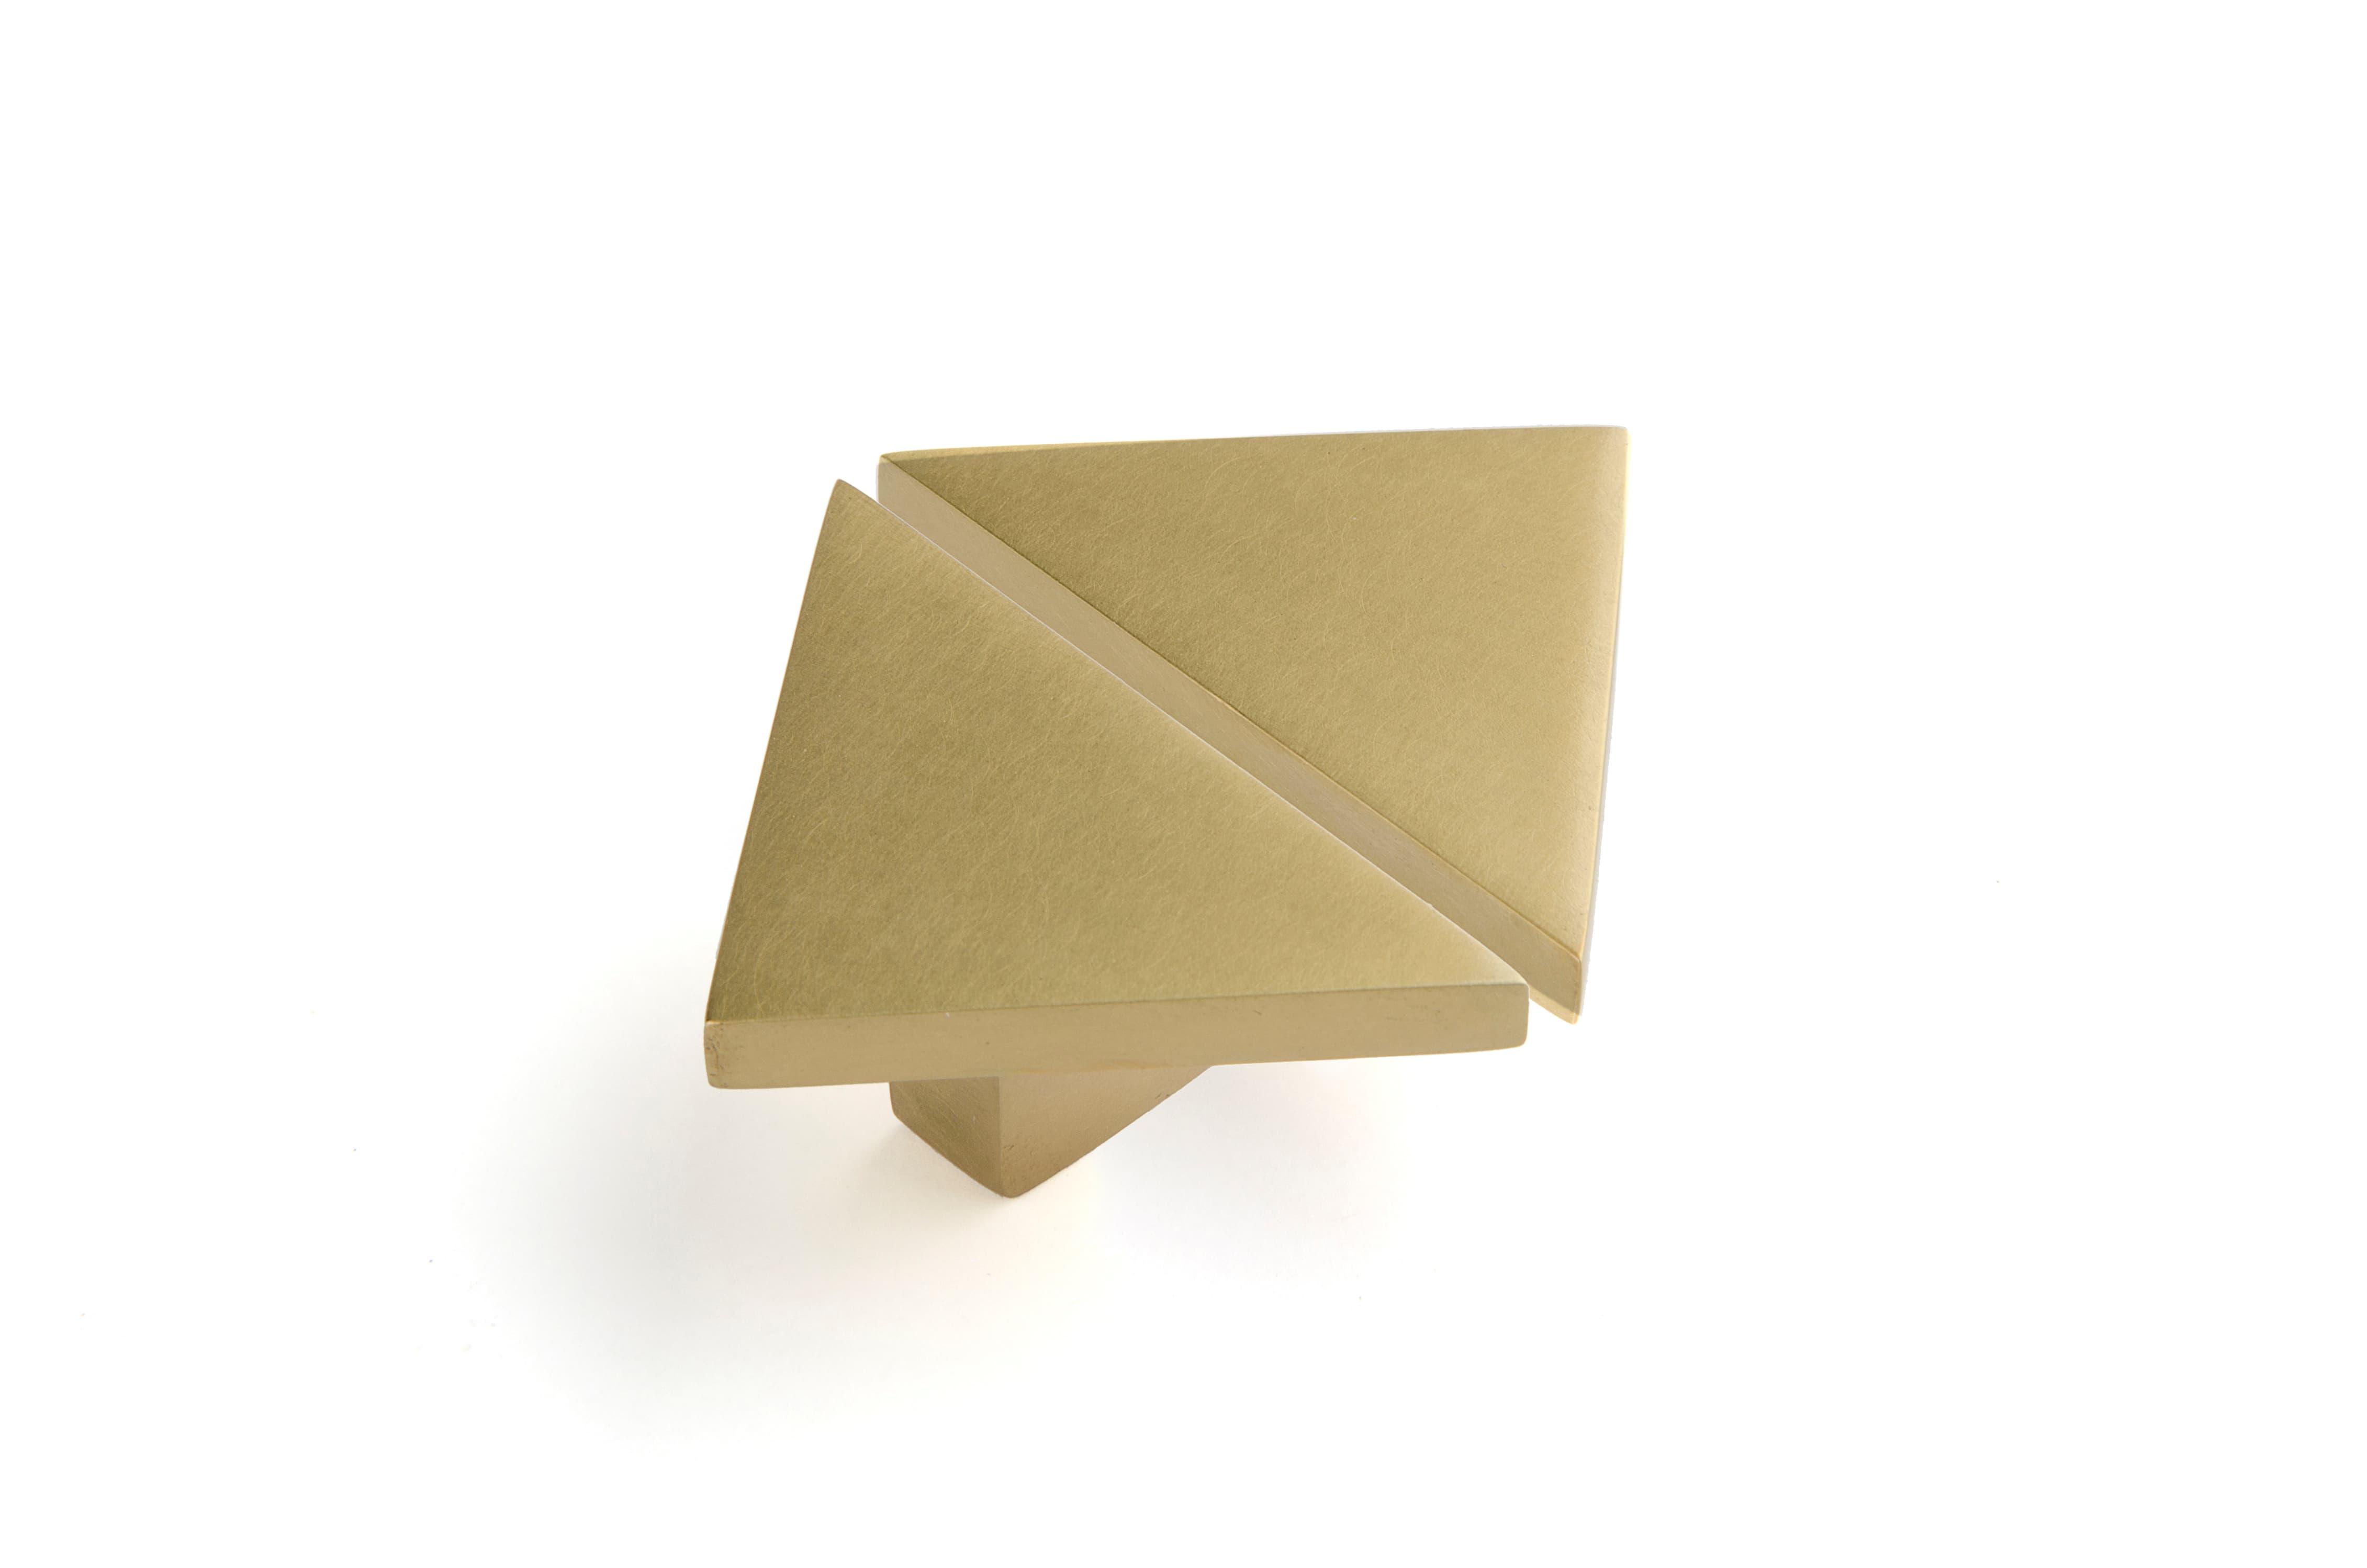 Фигурная ручка треугольник R032 - R032 | AnyHome.ru